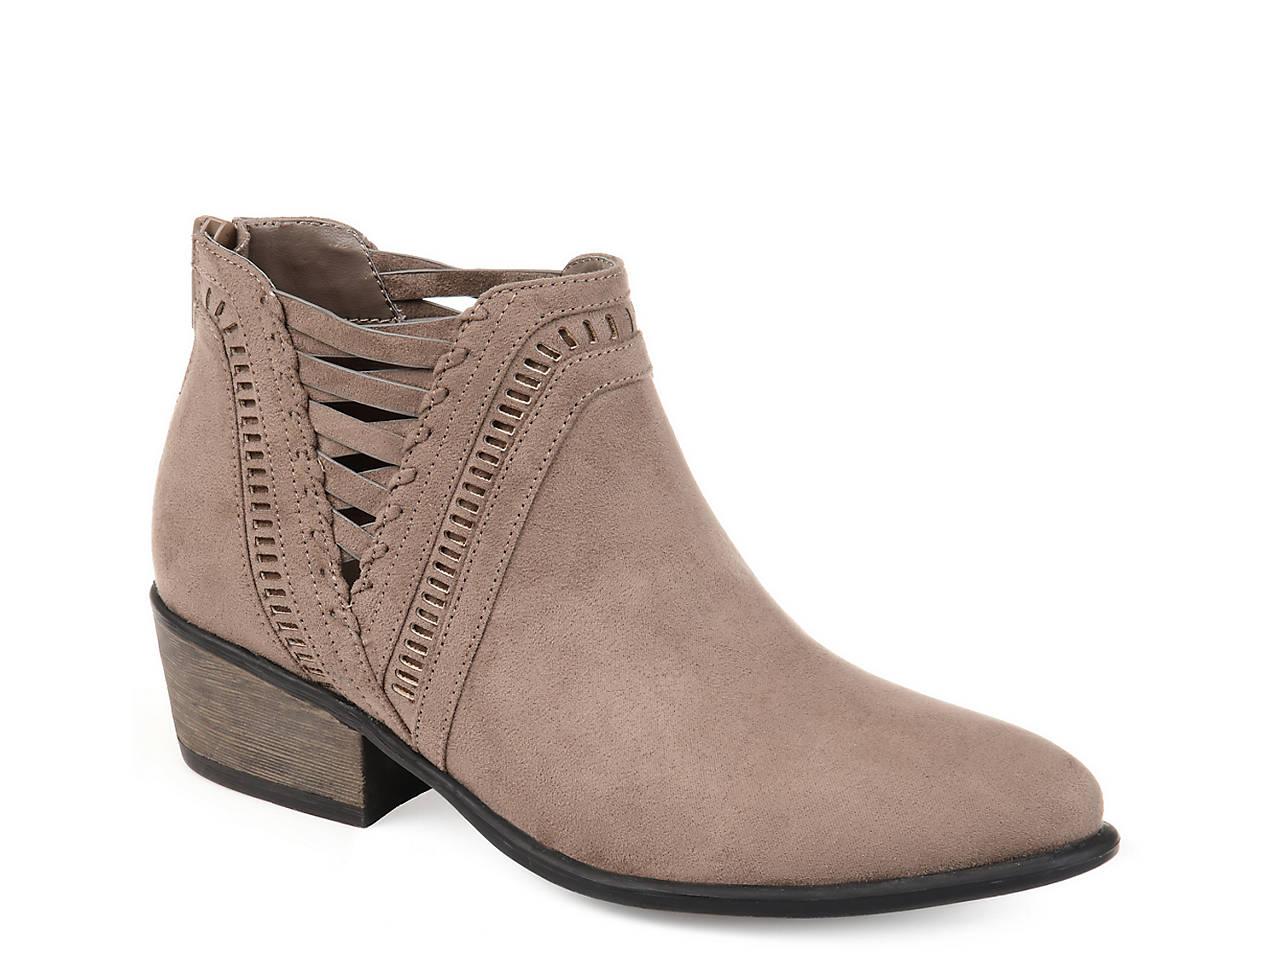 3224f4870b91b Journee Collection Jeni Bootie Women s Shoes